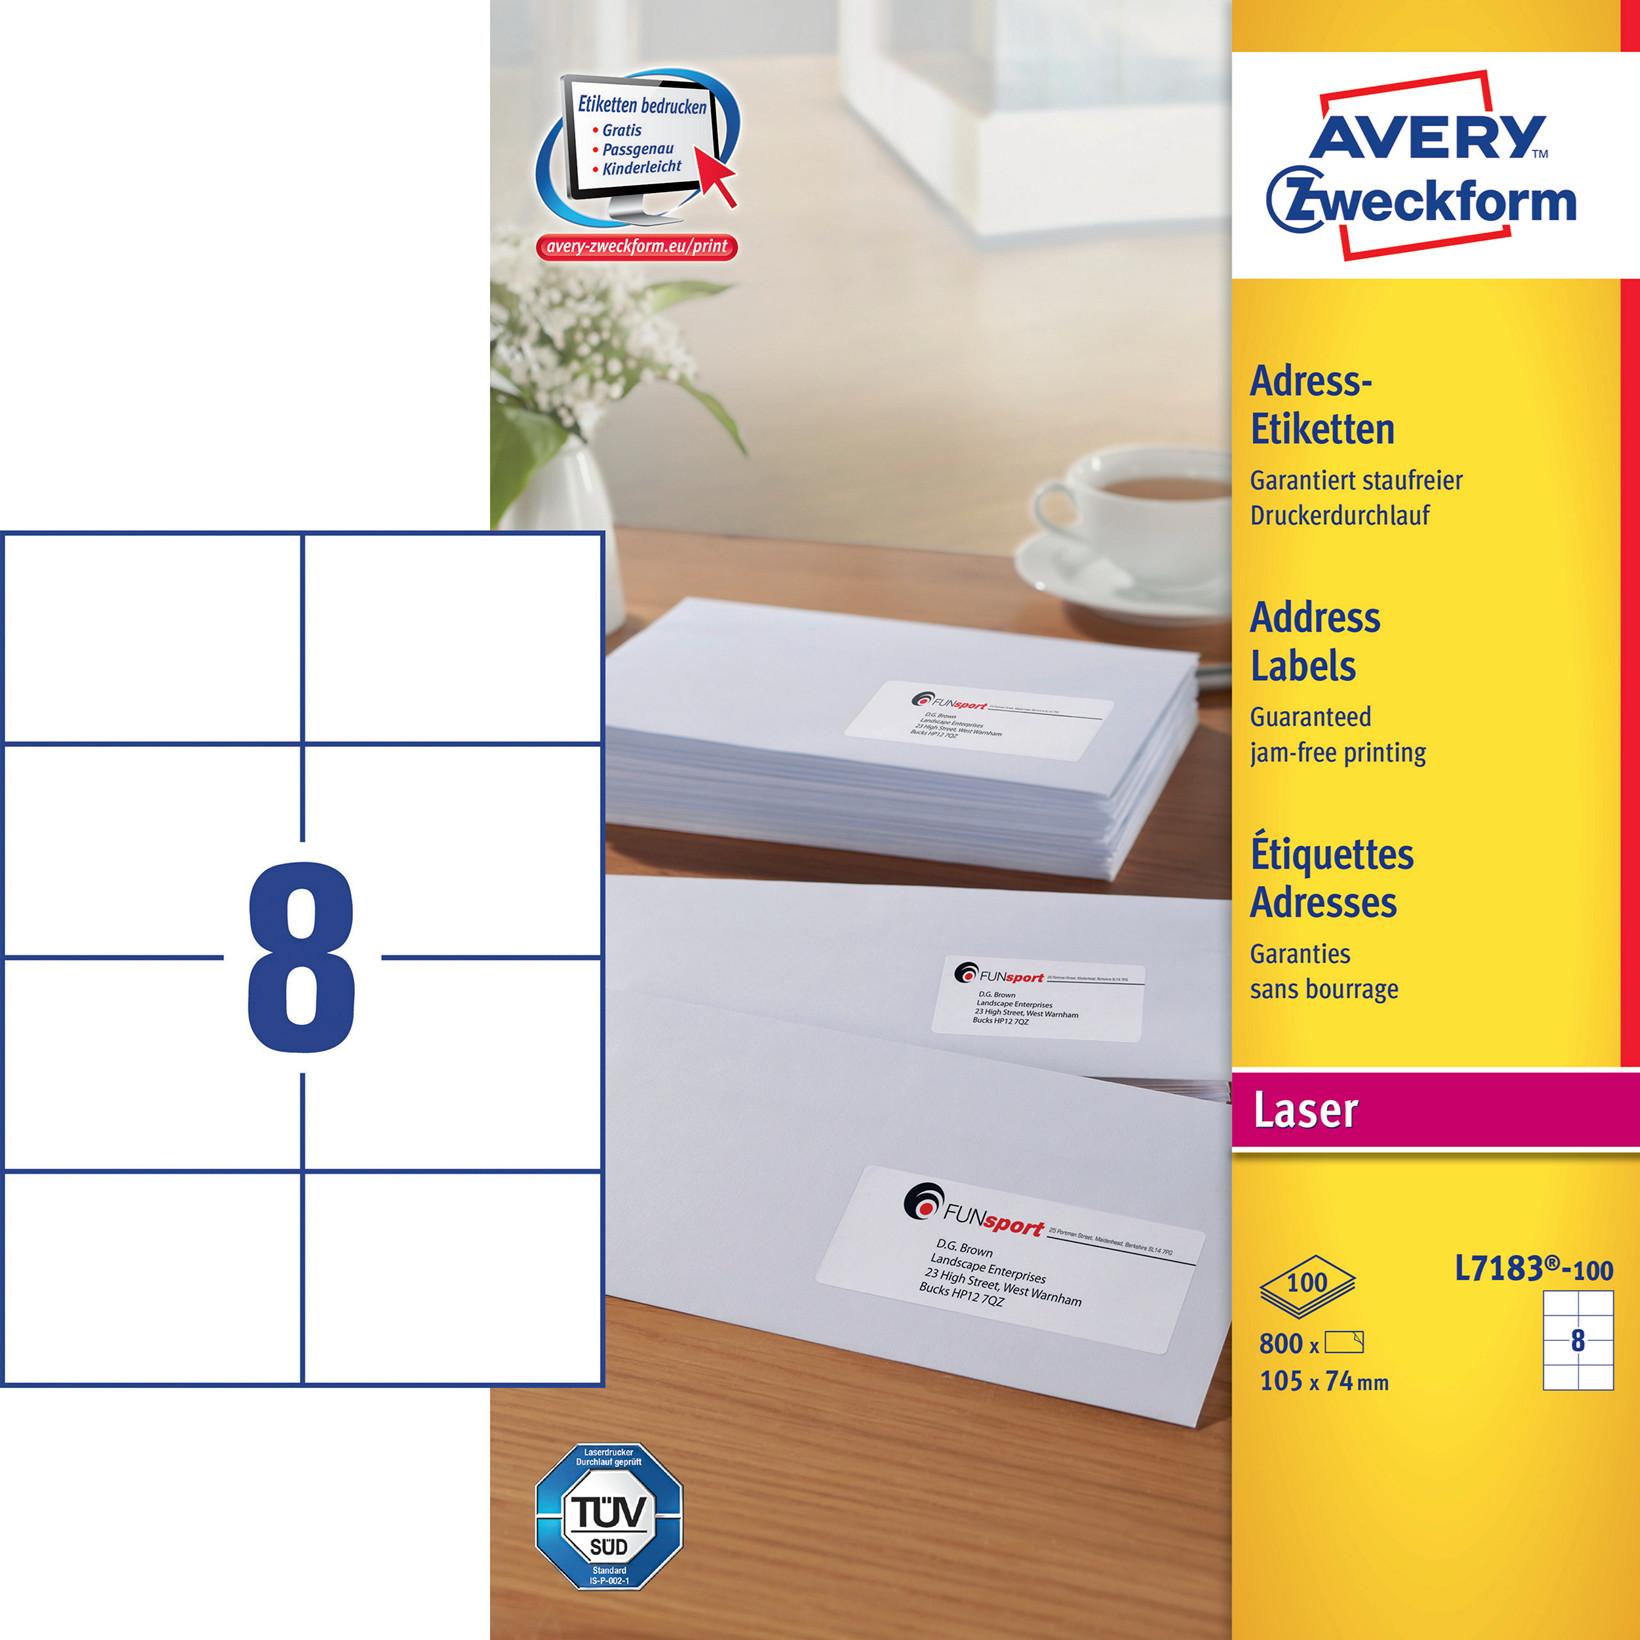 Avery L7183  -  Laser etiket 8 pr. ark 105 x 74 mm - 100 ark